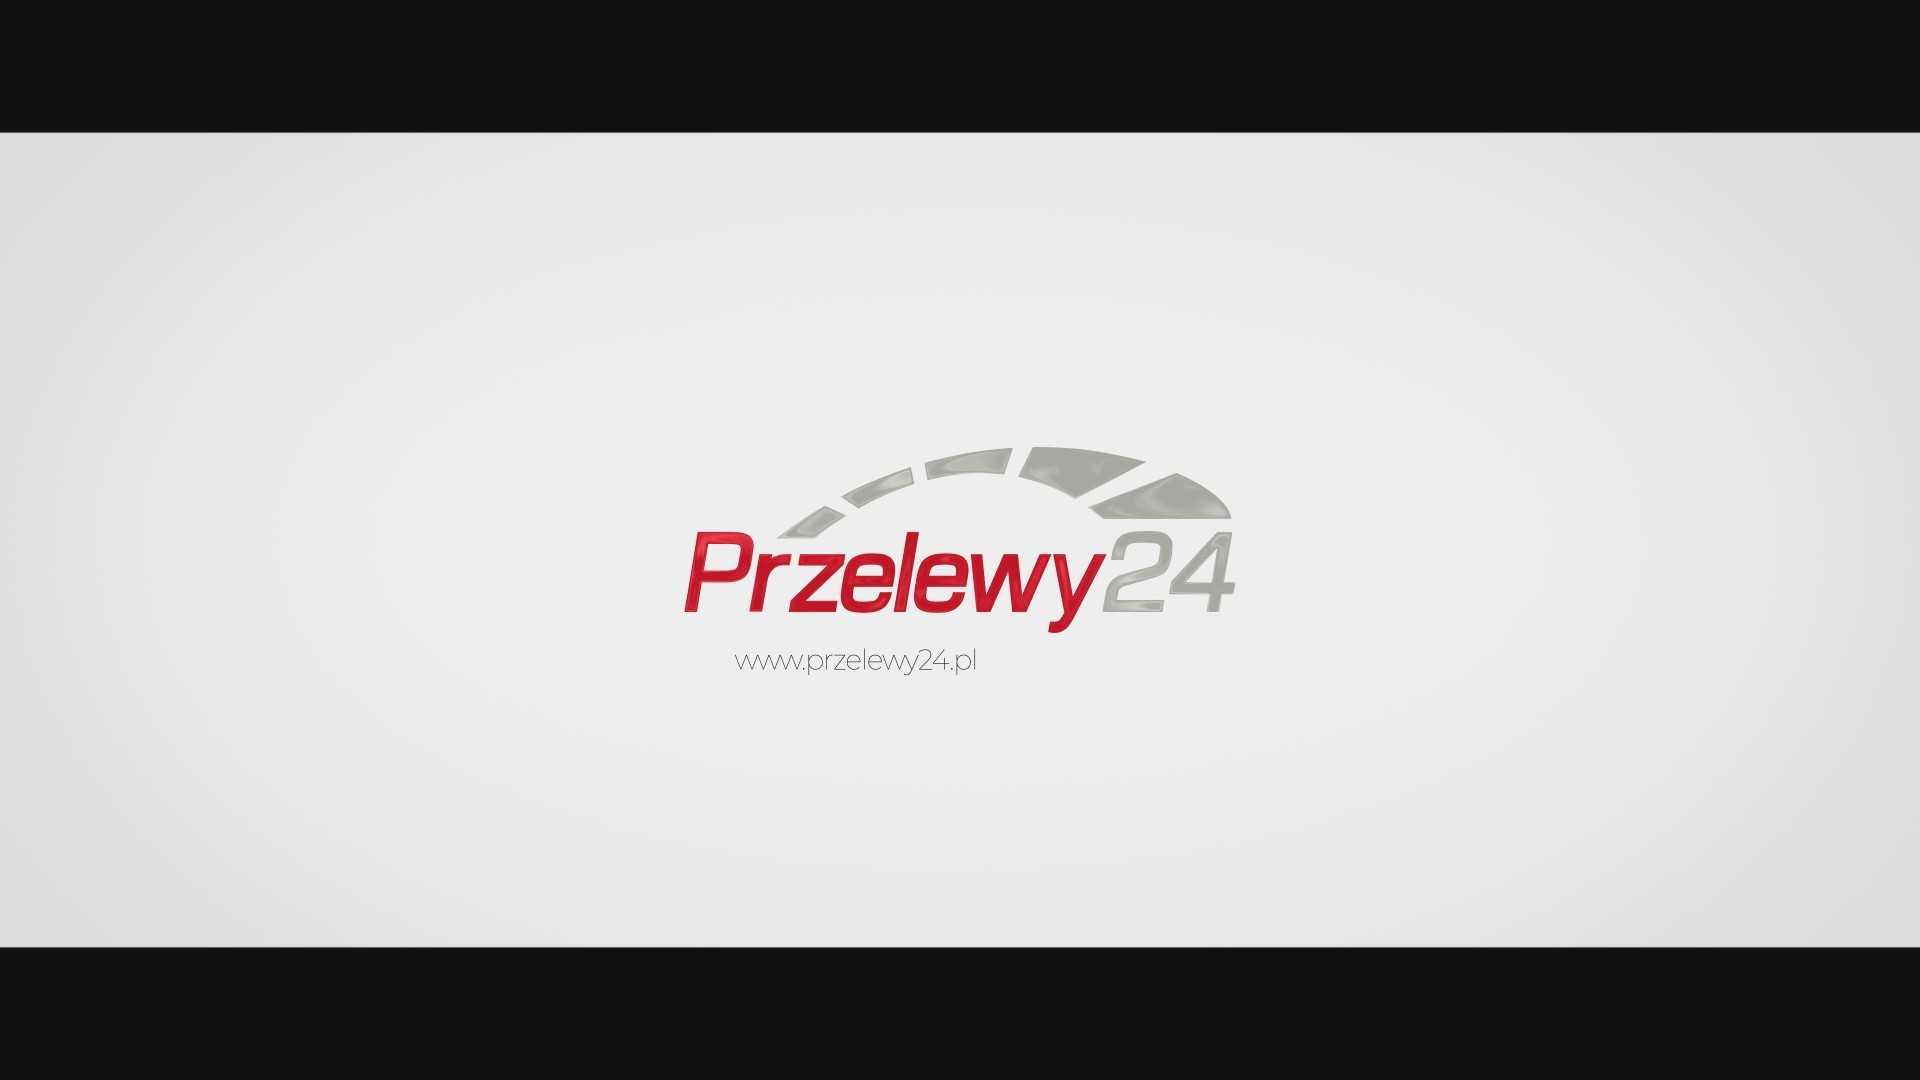 Przelewy24 – Targi eHandlu Kraków Expo 17.04.2019r. (E-commerce Poland Trade Fair)